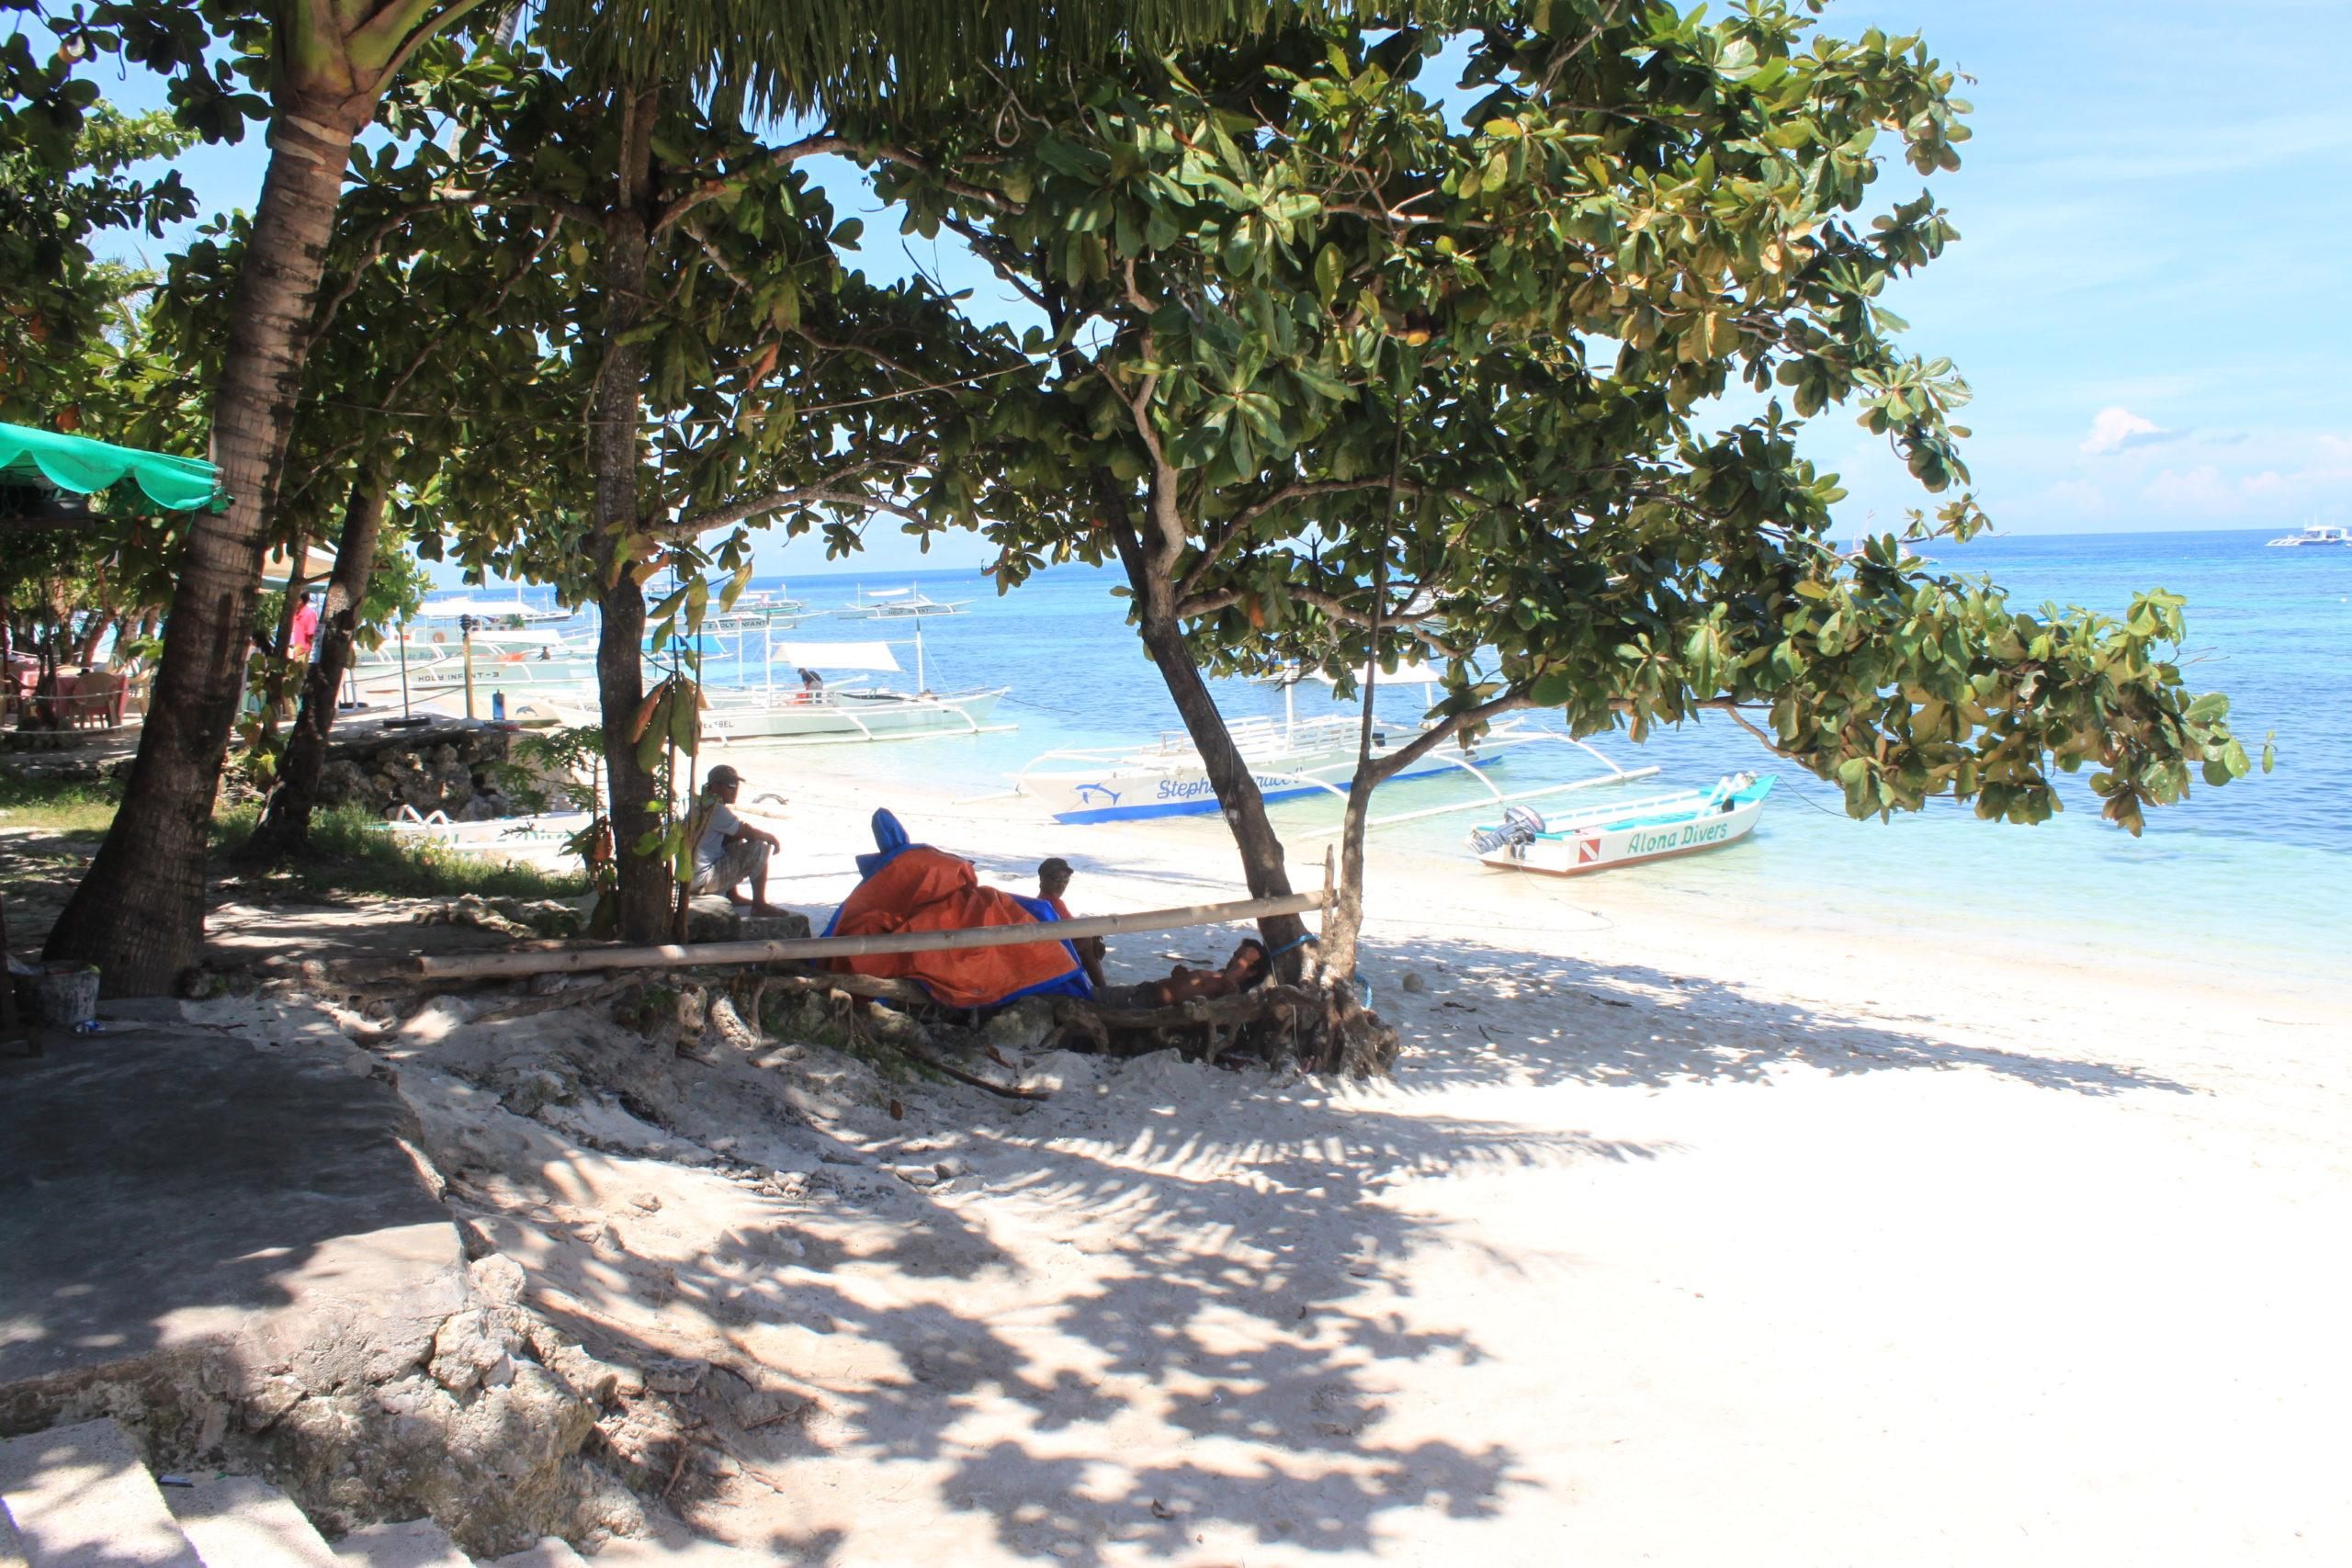 Alona beach resorts panglao island, bohol philippines